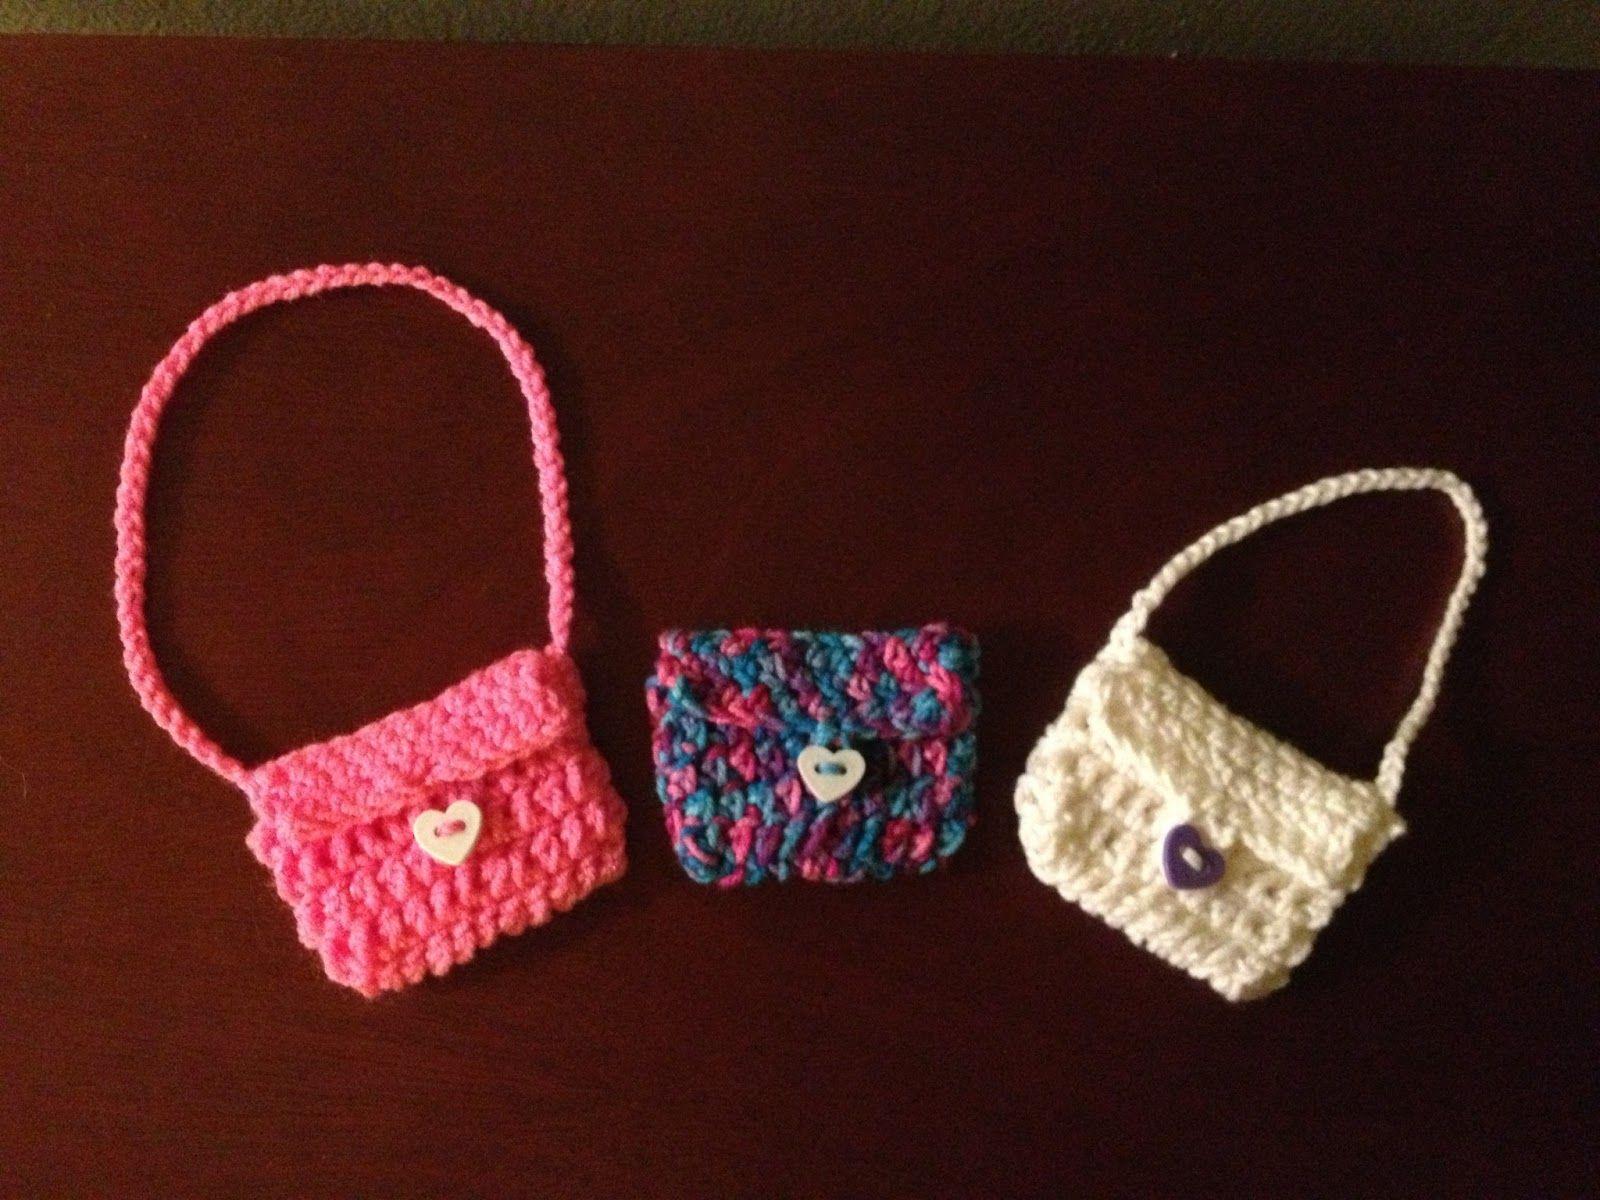 Cupcake Purse & Chef Bear Doll, Annie's crochet pattern leaflet | eBay | 1200x1600